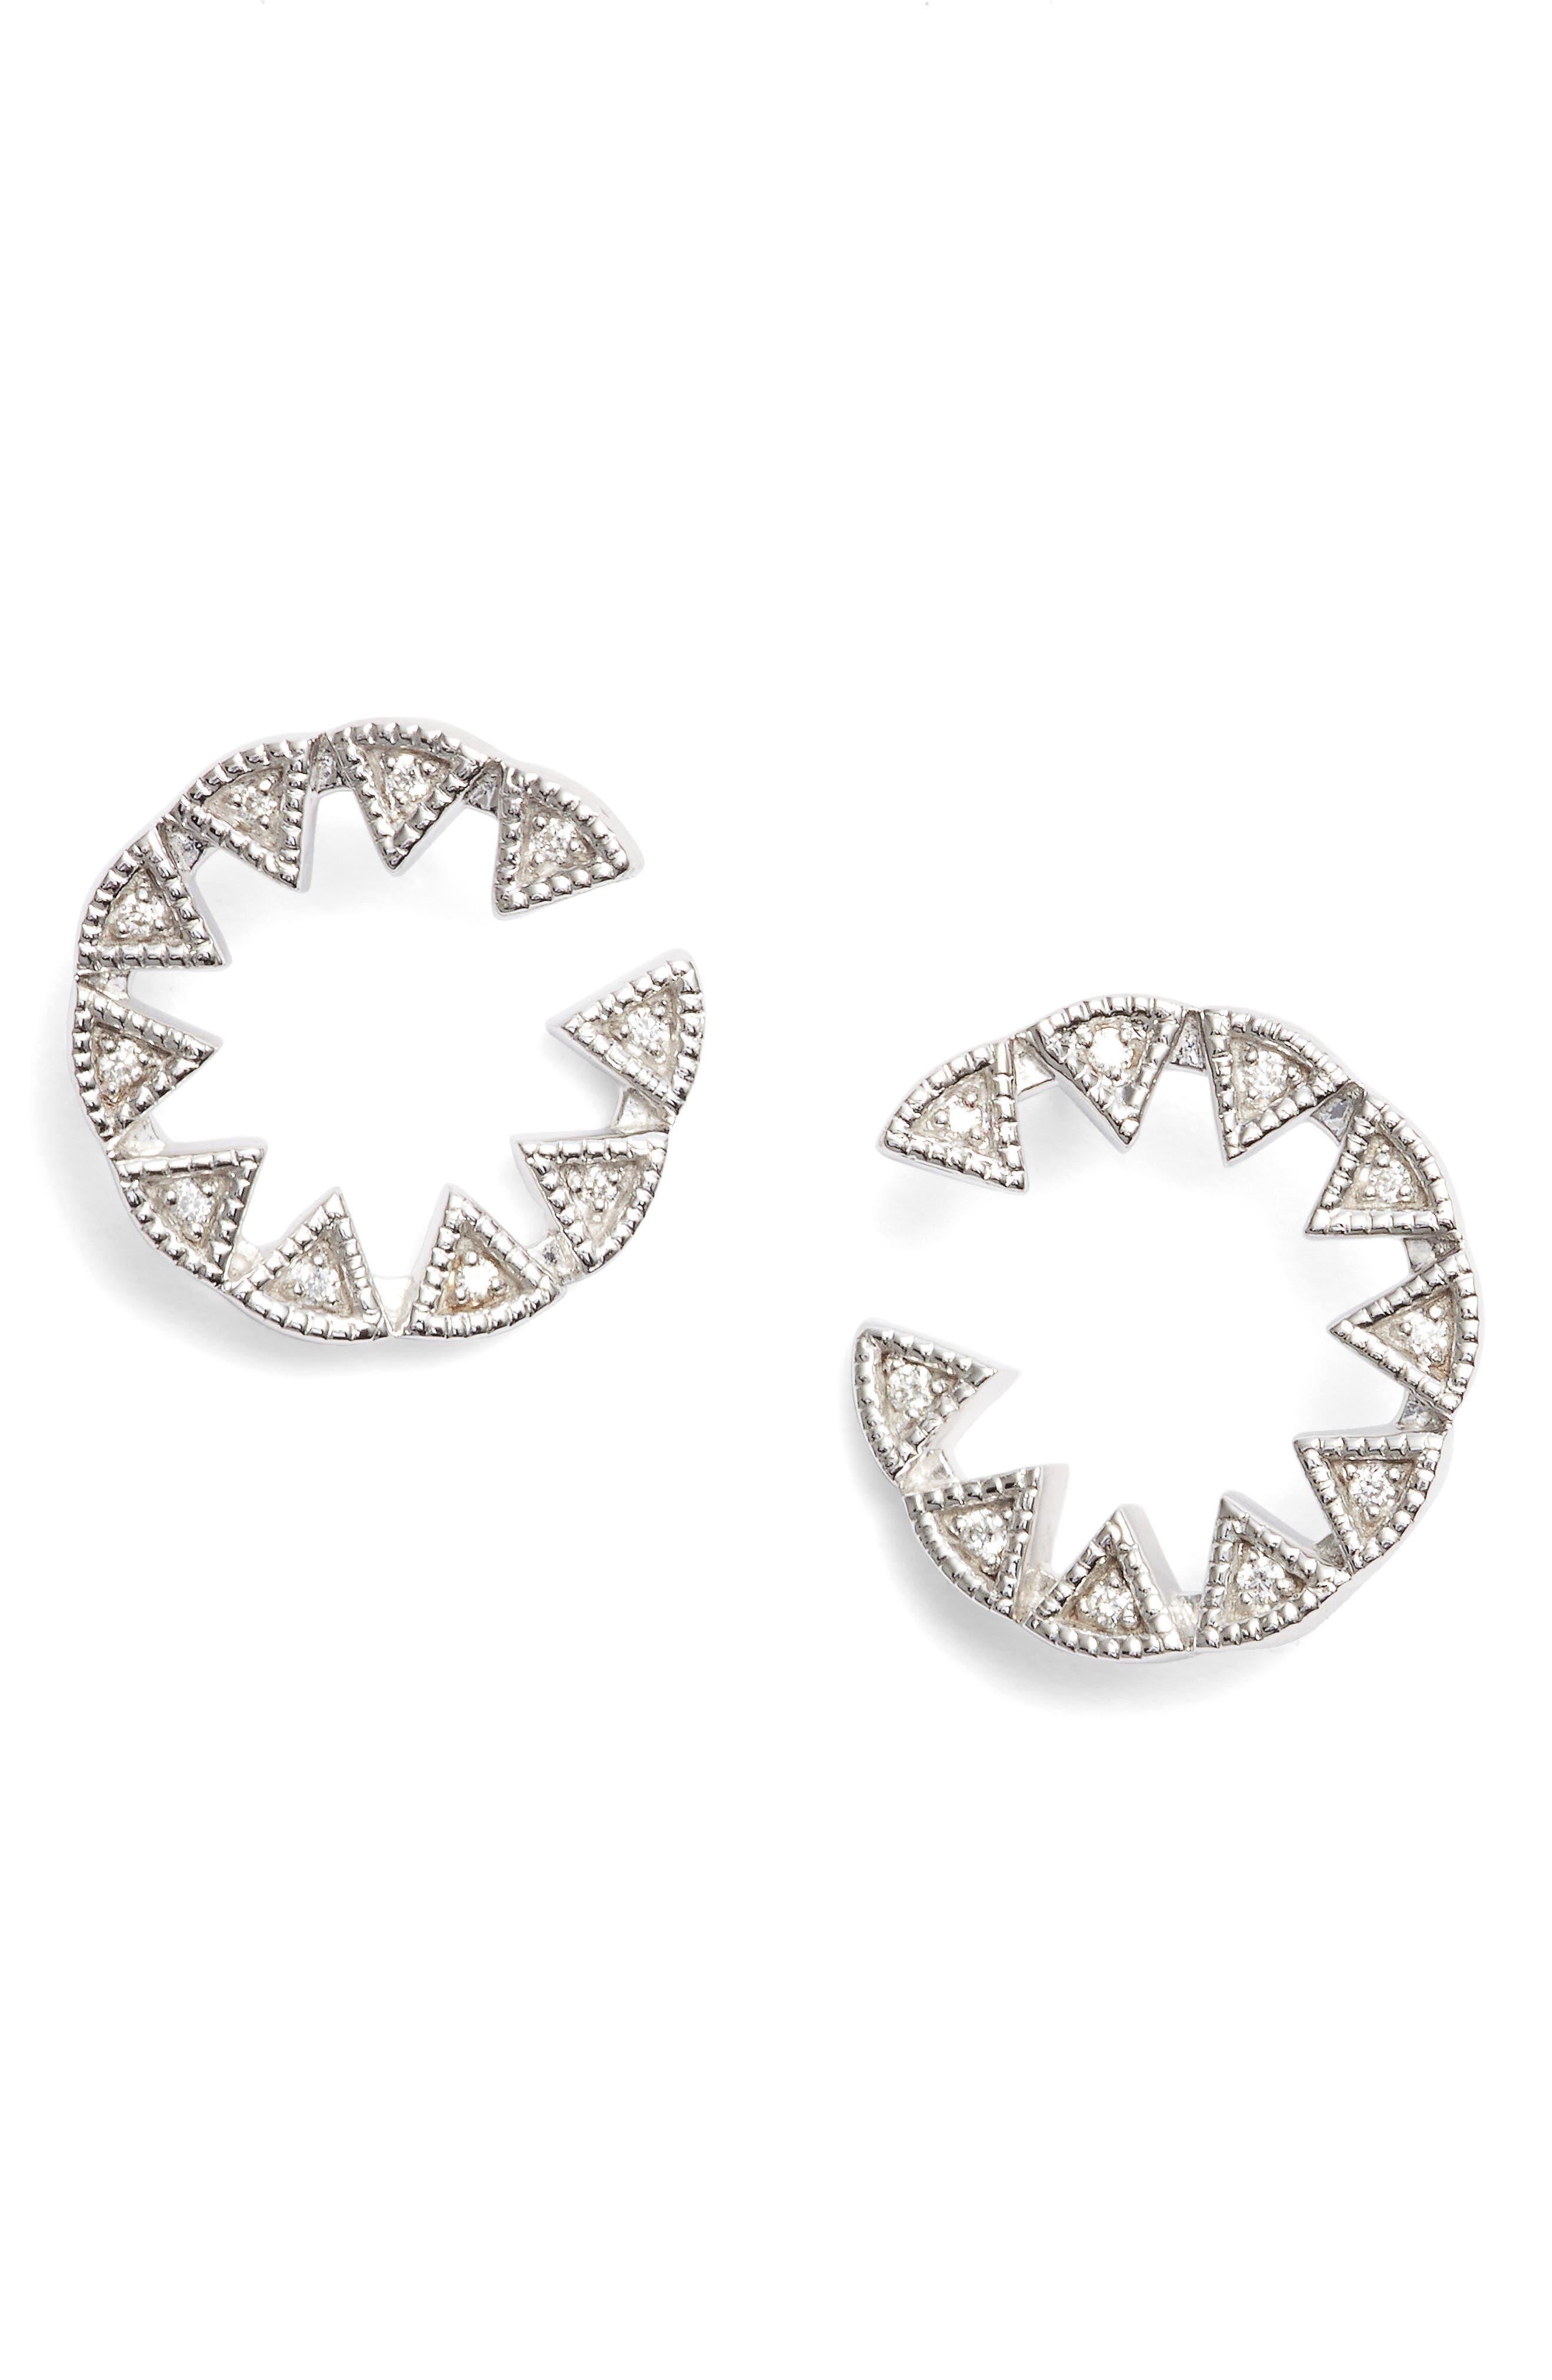 Emily Sarah Triangle Diamond Stud Earrings,                             Main thumbnail 1, color,                             White Gold